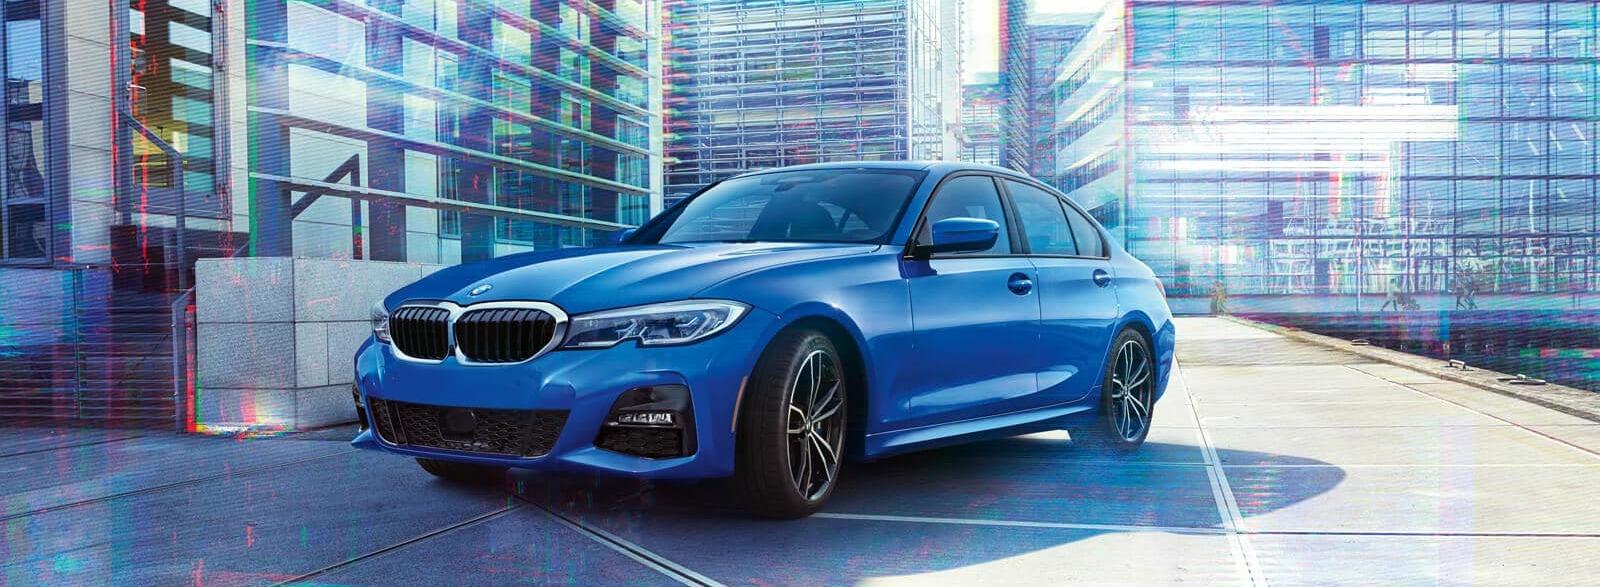 2020 BMW 3 Series Financing in Shreveport, LA